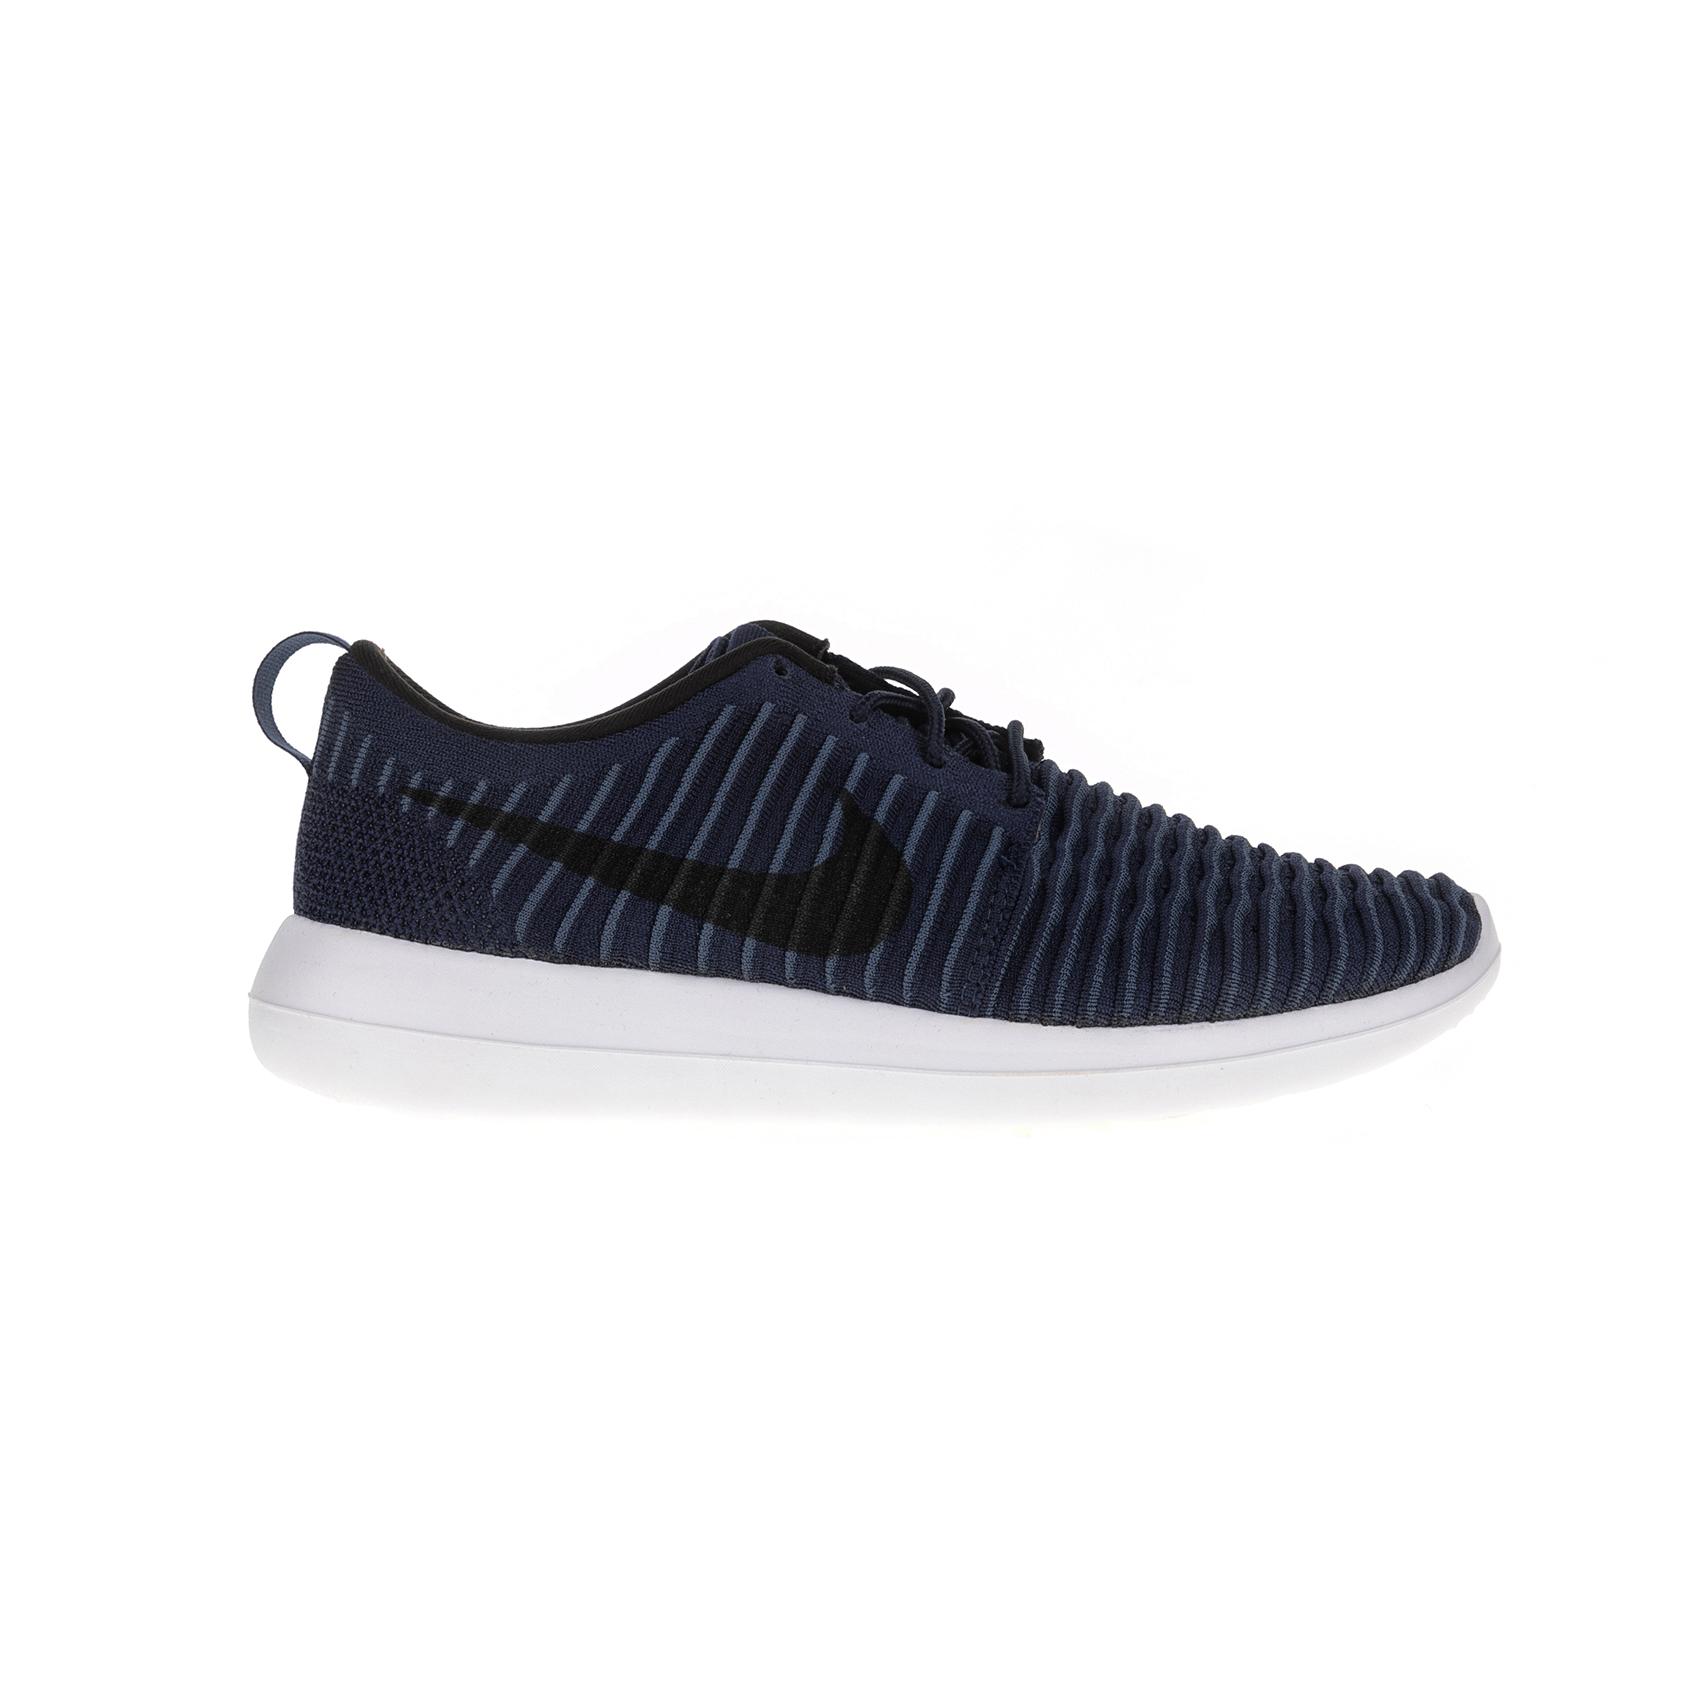 NIKE – Ανδρικά αθλητικά παπούτσια Nike ROSHE TWO FLYKNIT μπλε